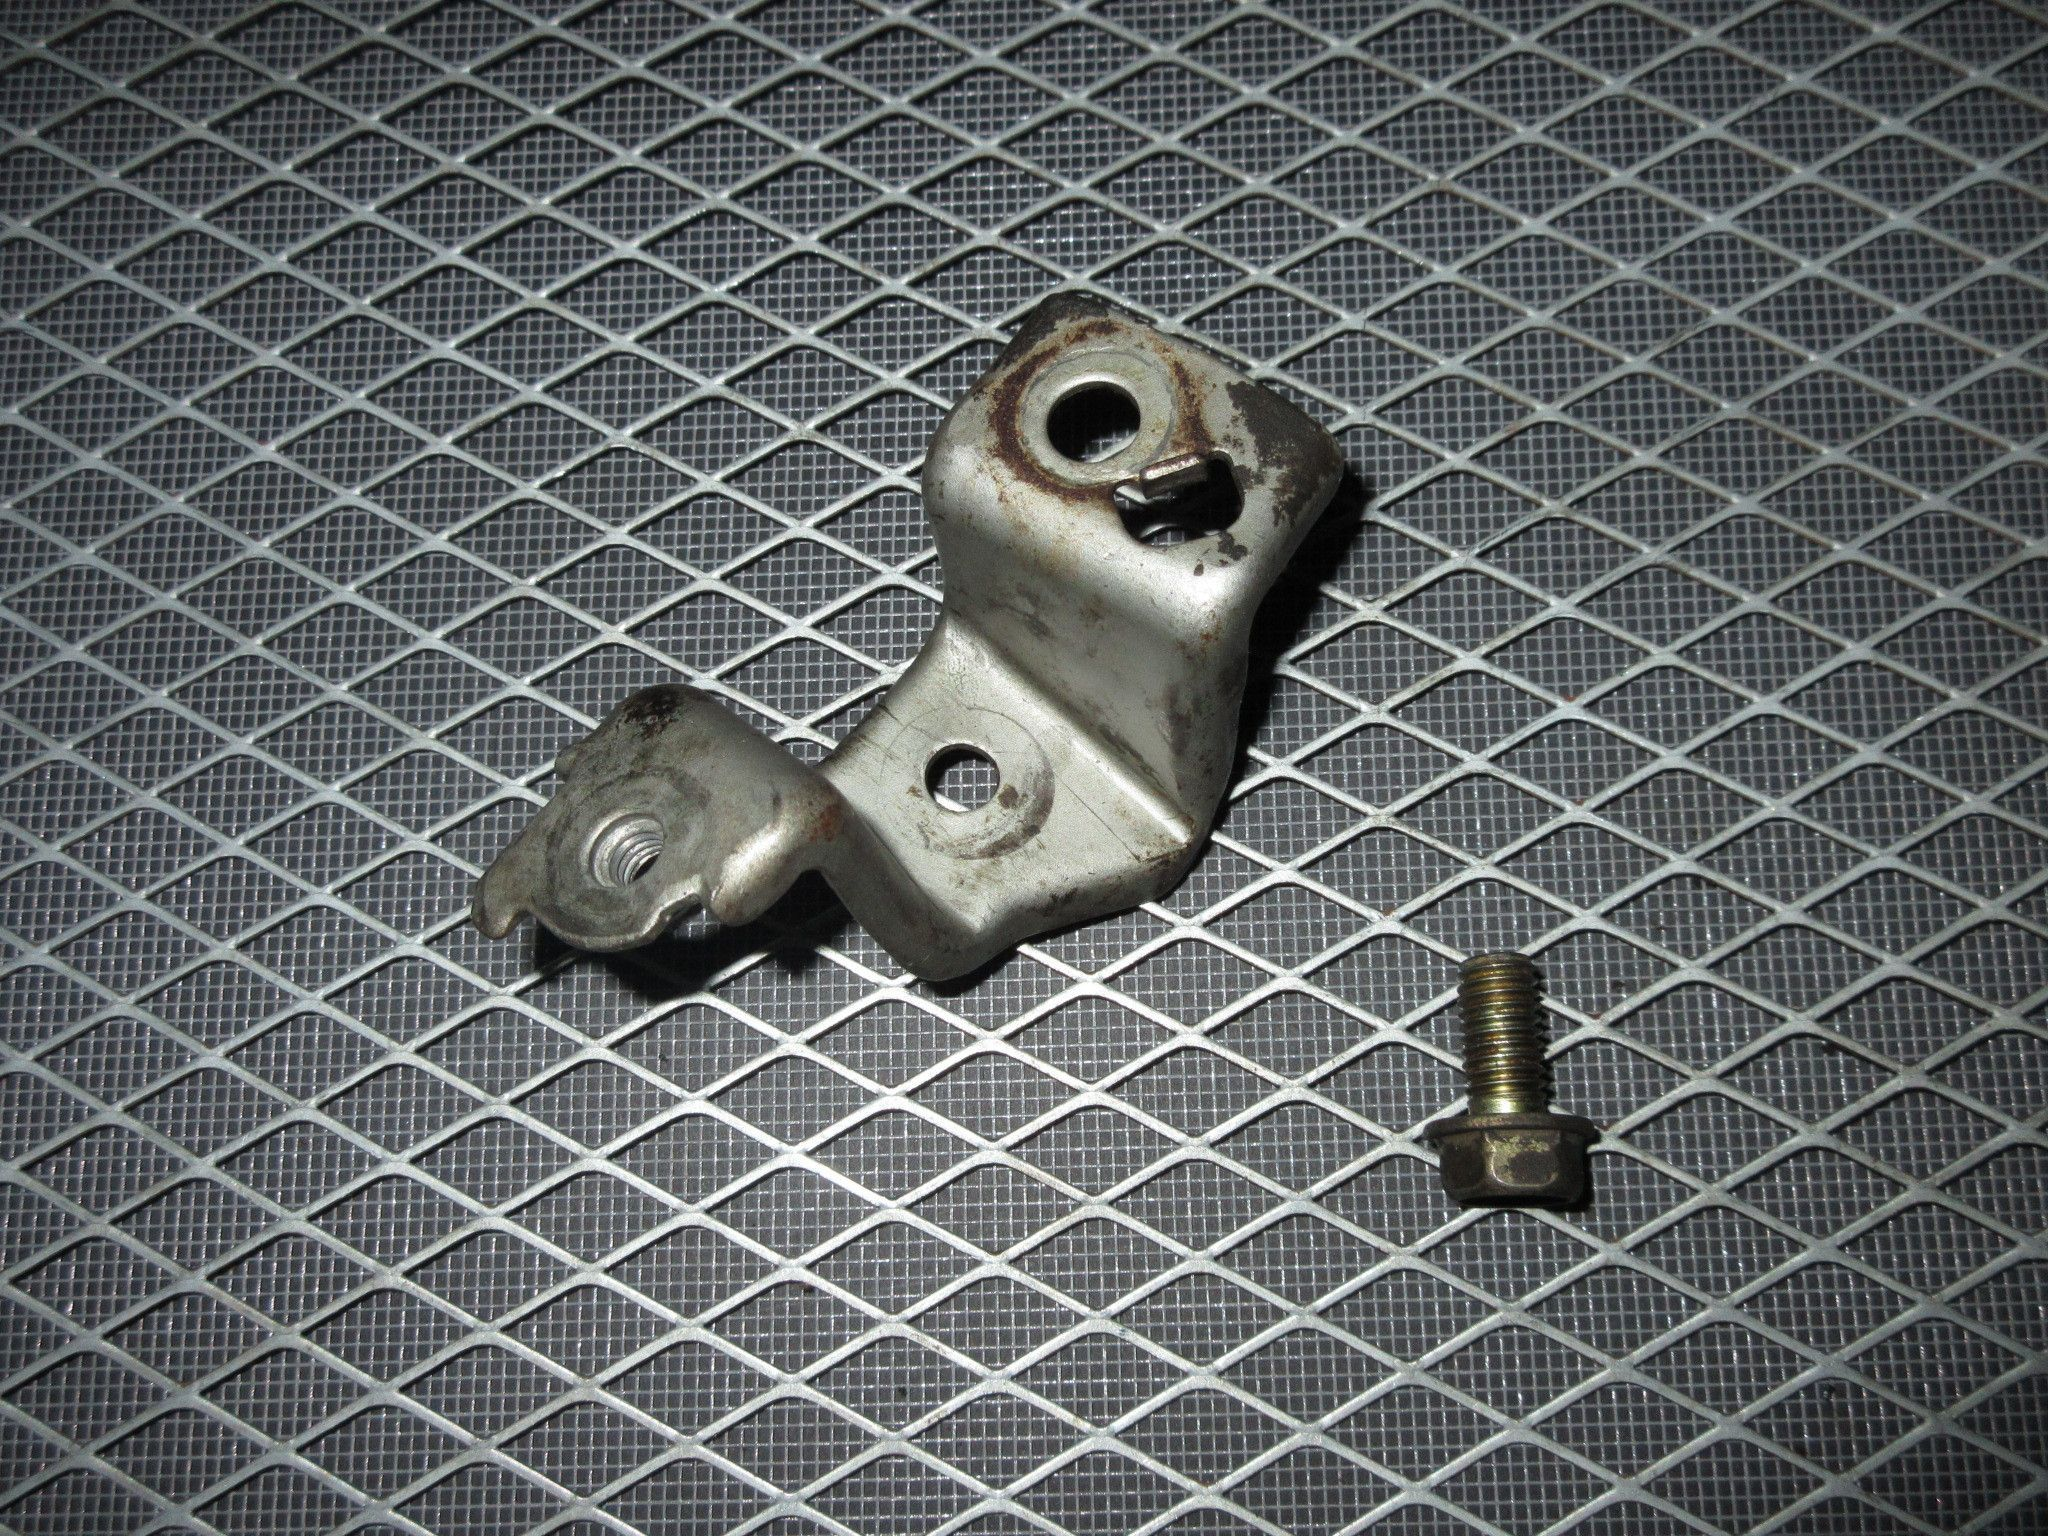 medium resolution of jdm 94 95 96 97 honda accord f22b none vtec engine wiring harness holder bracket